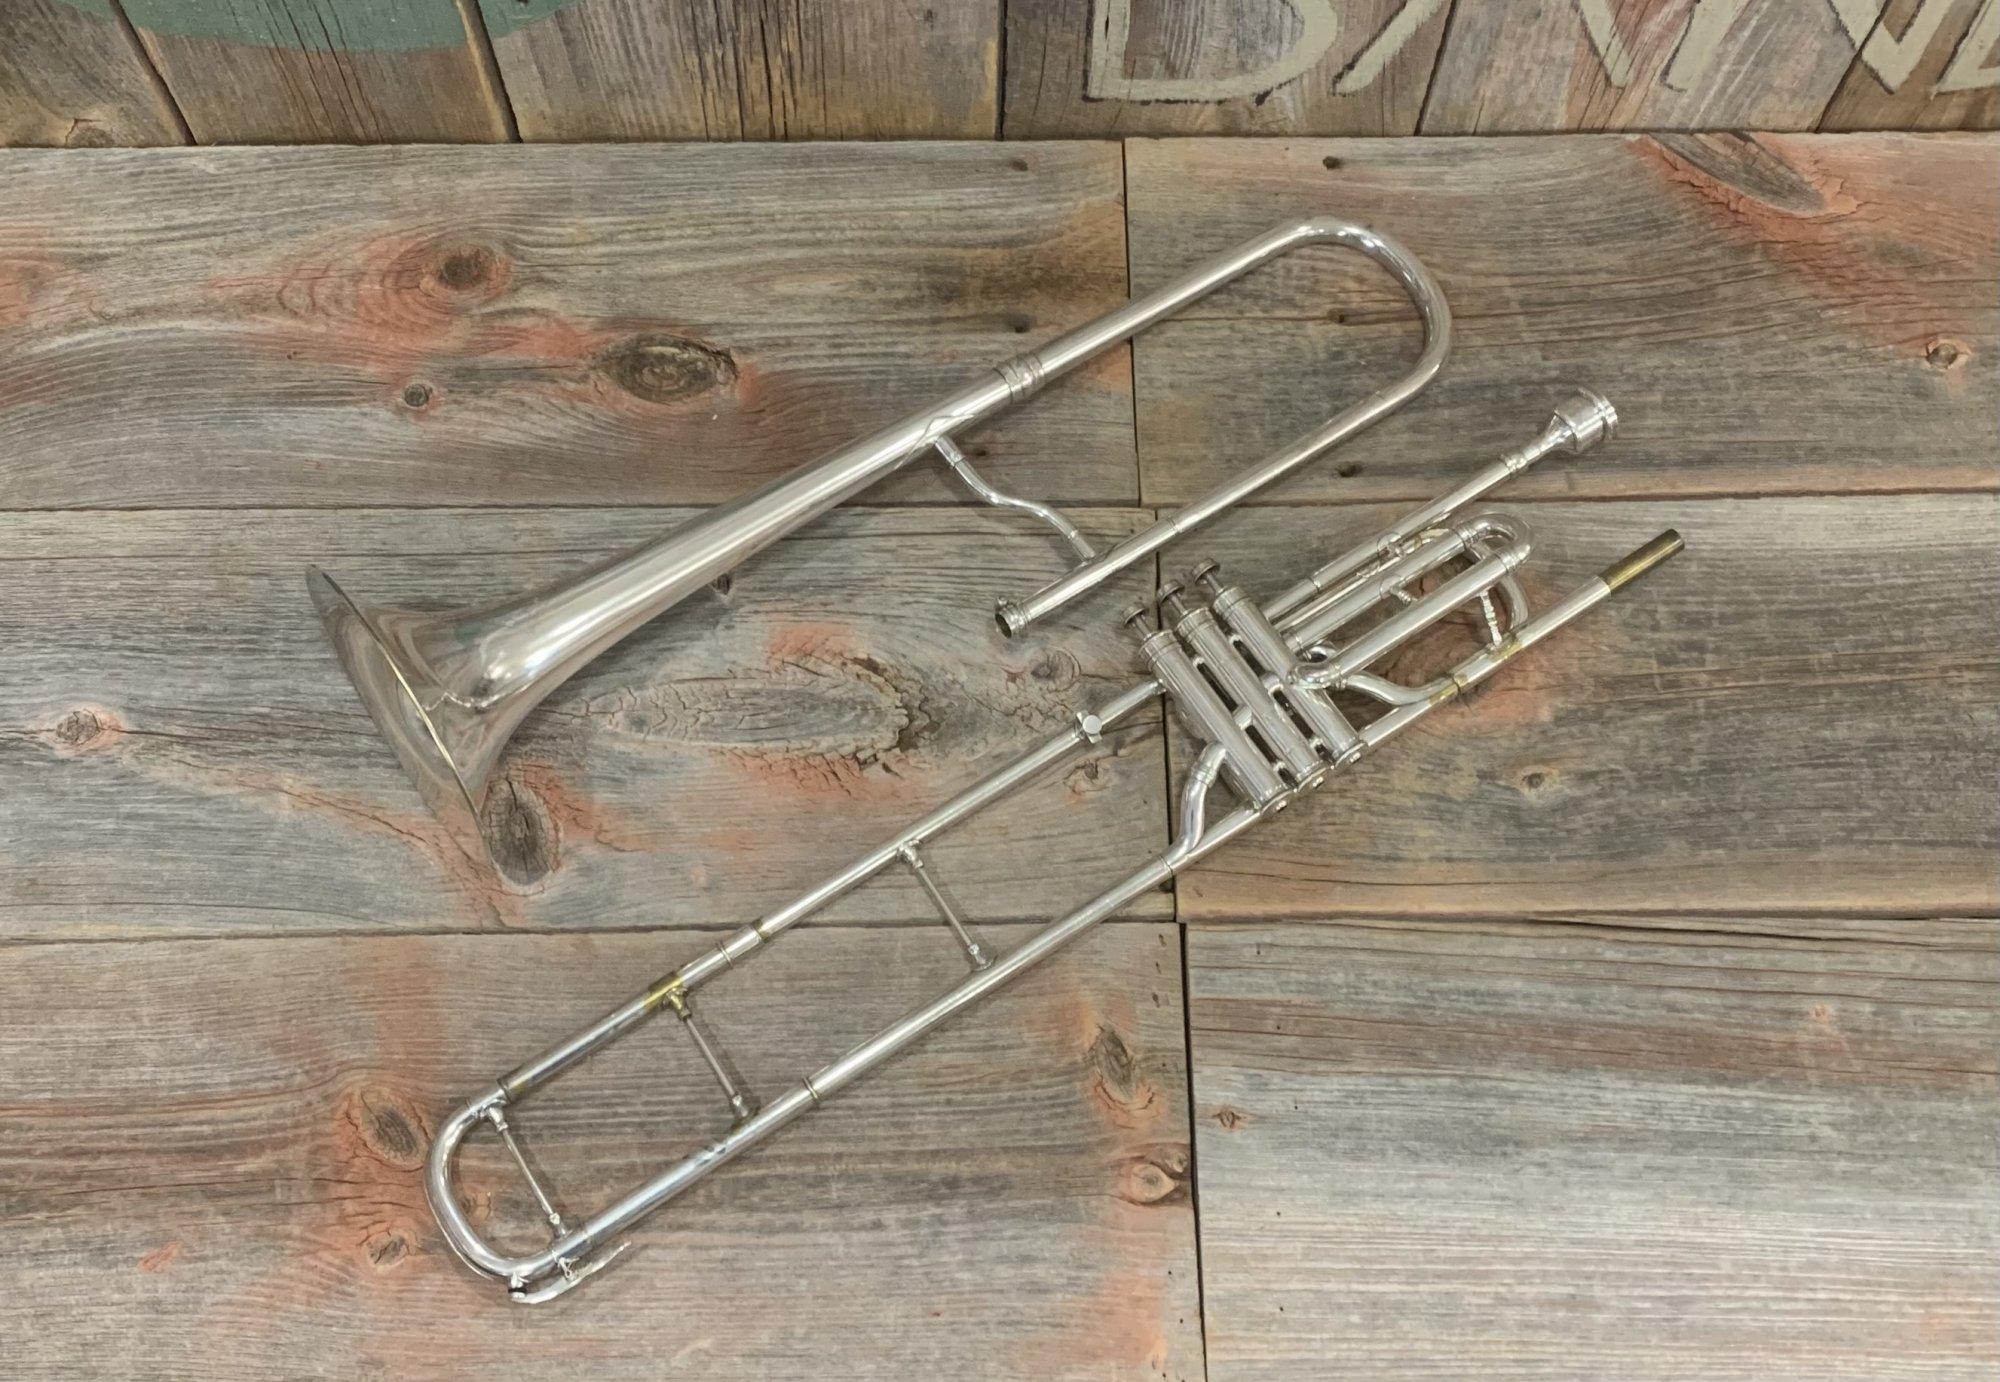 C.G. Conn 4G Valve Trombone 1914 - Consignment